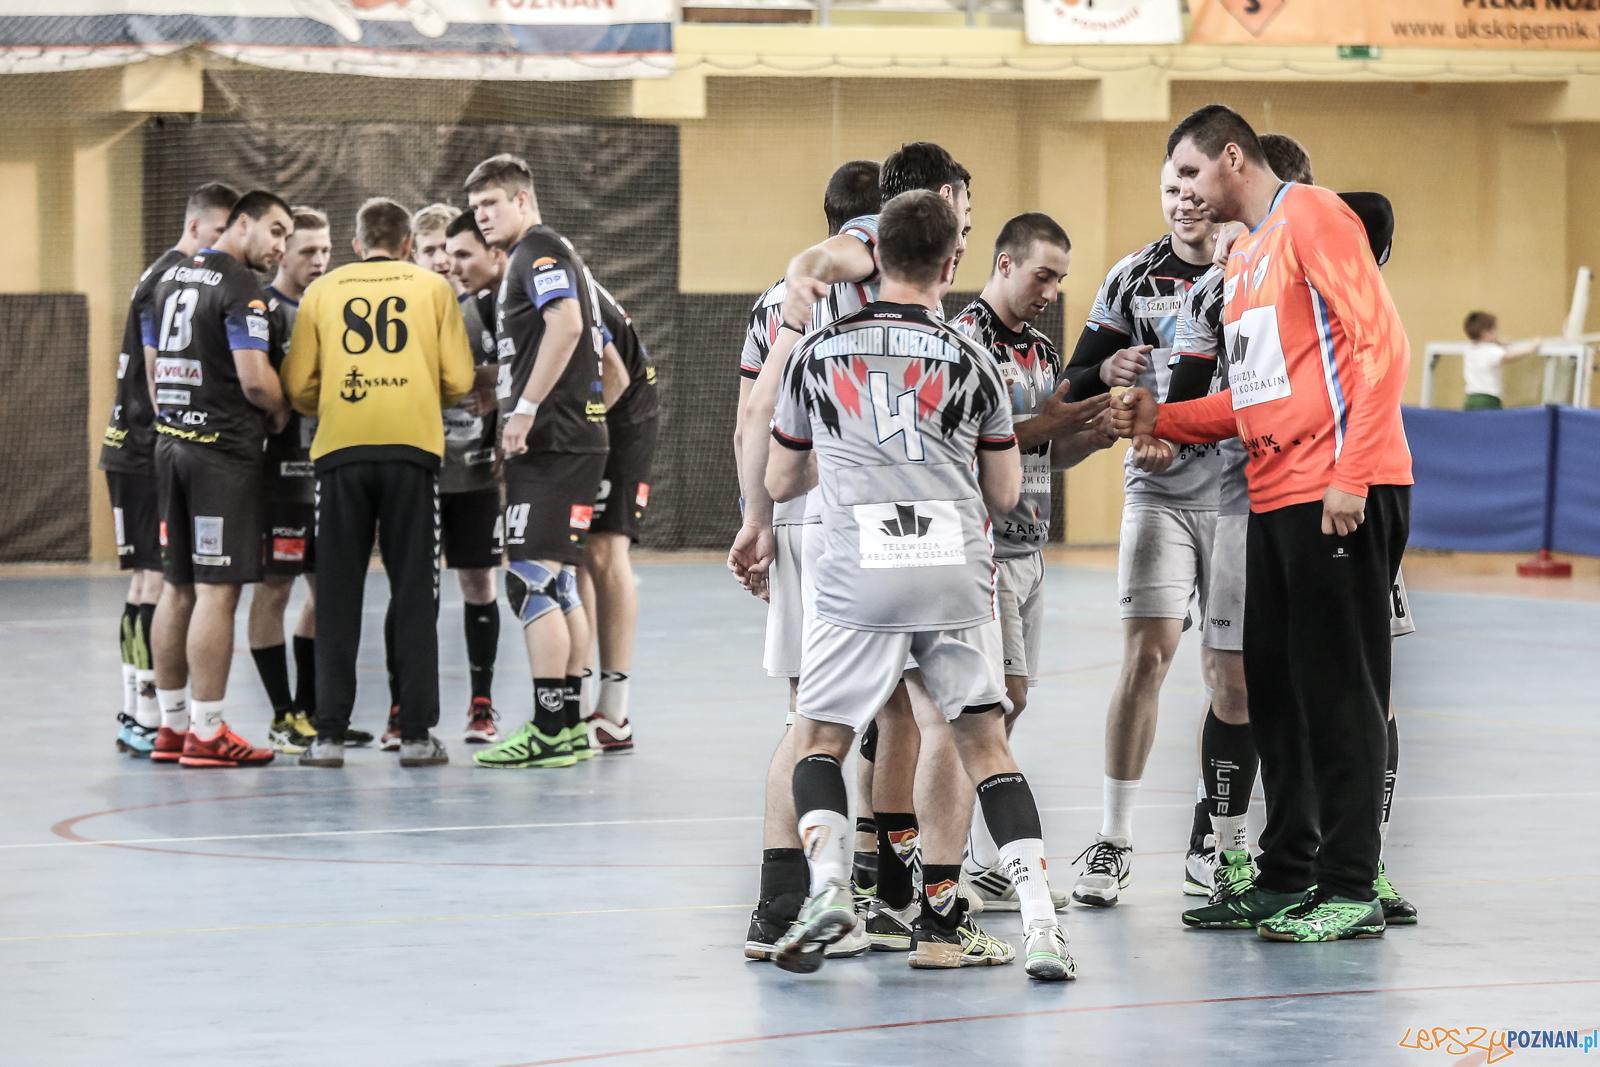 WKS Grunwald Poznań vs KPR Gwardia Koszalin (30.09.2017)  Foto: © lepszyPOZNAN.pl / Karolina Kiraga